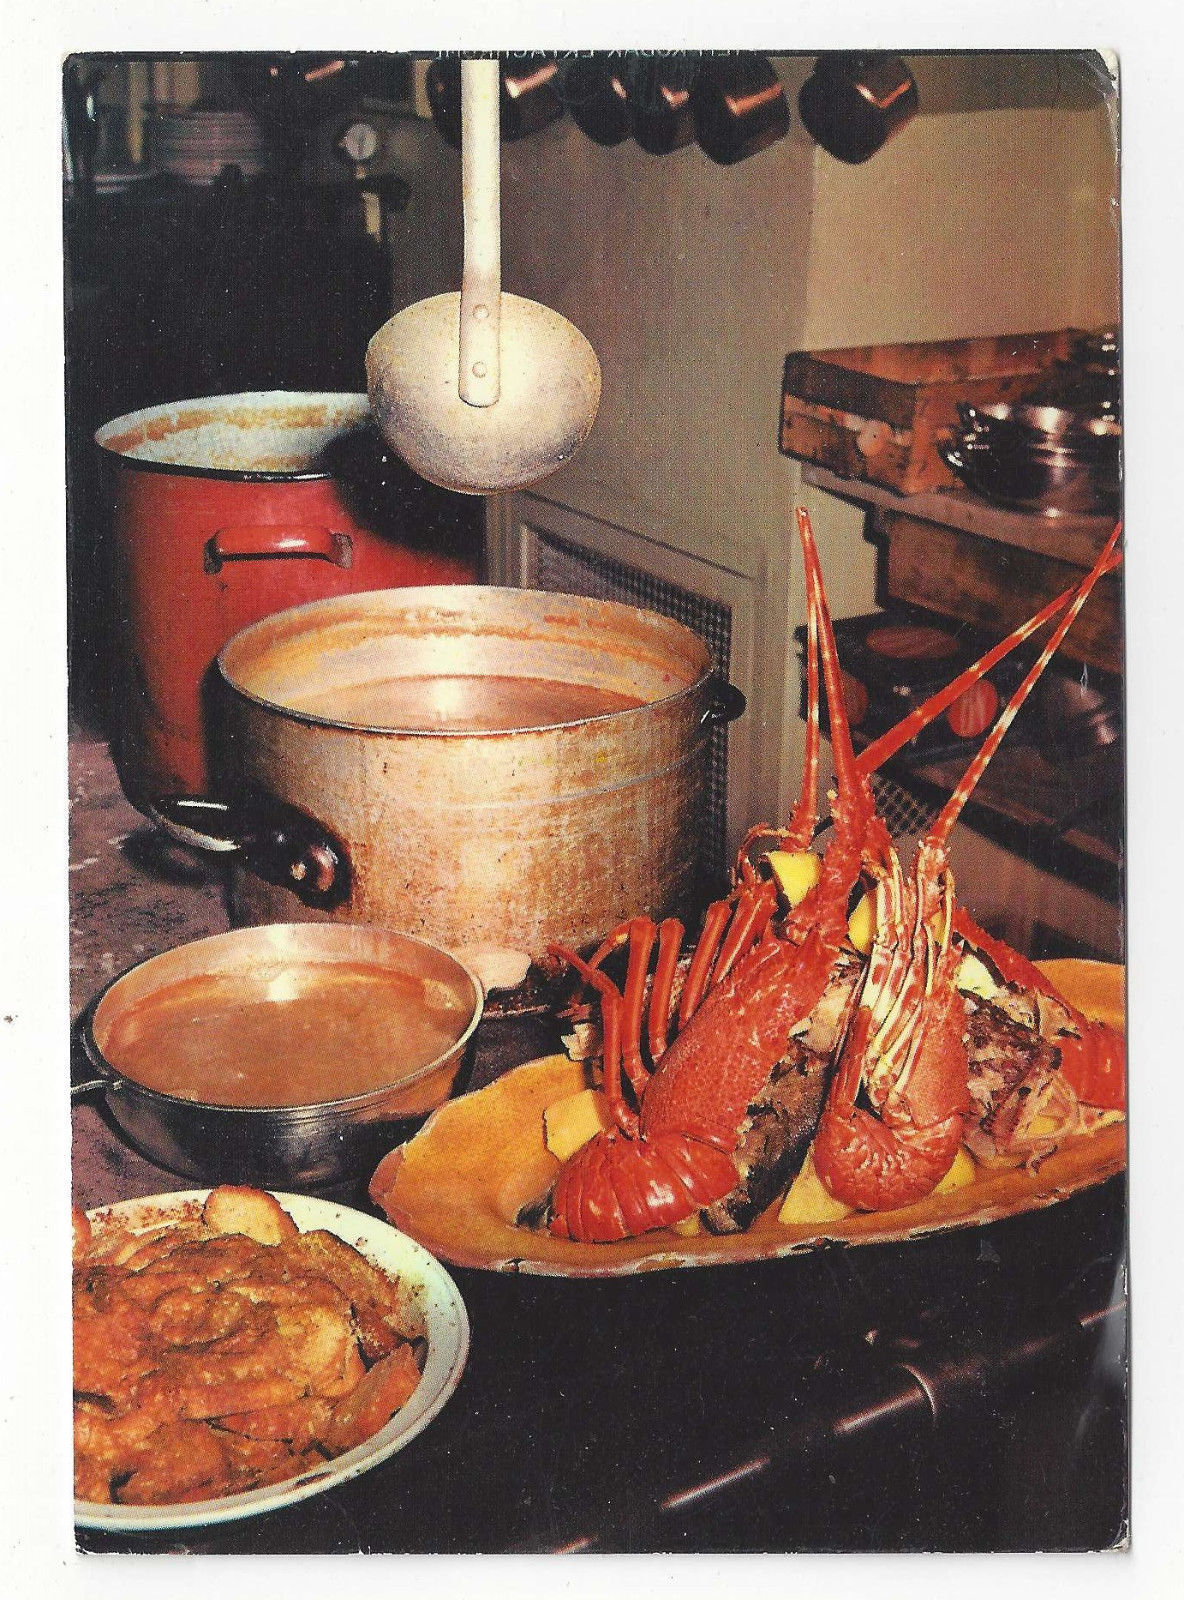 France Restaurant Lobsters La Mere Terrats Napoule Plage Vtg Food Postcard 4X6